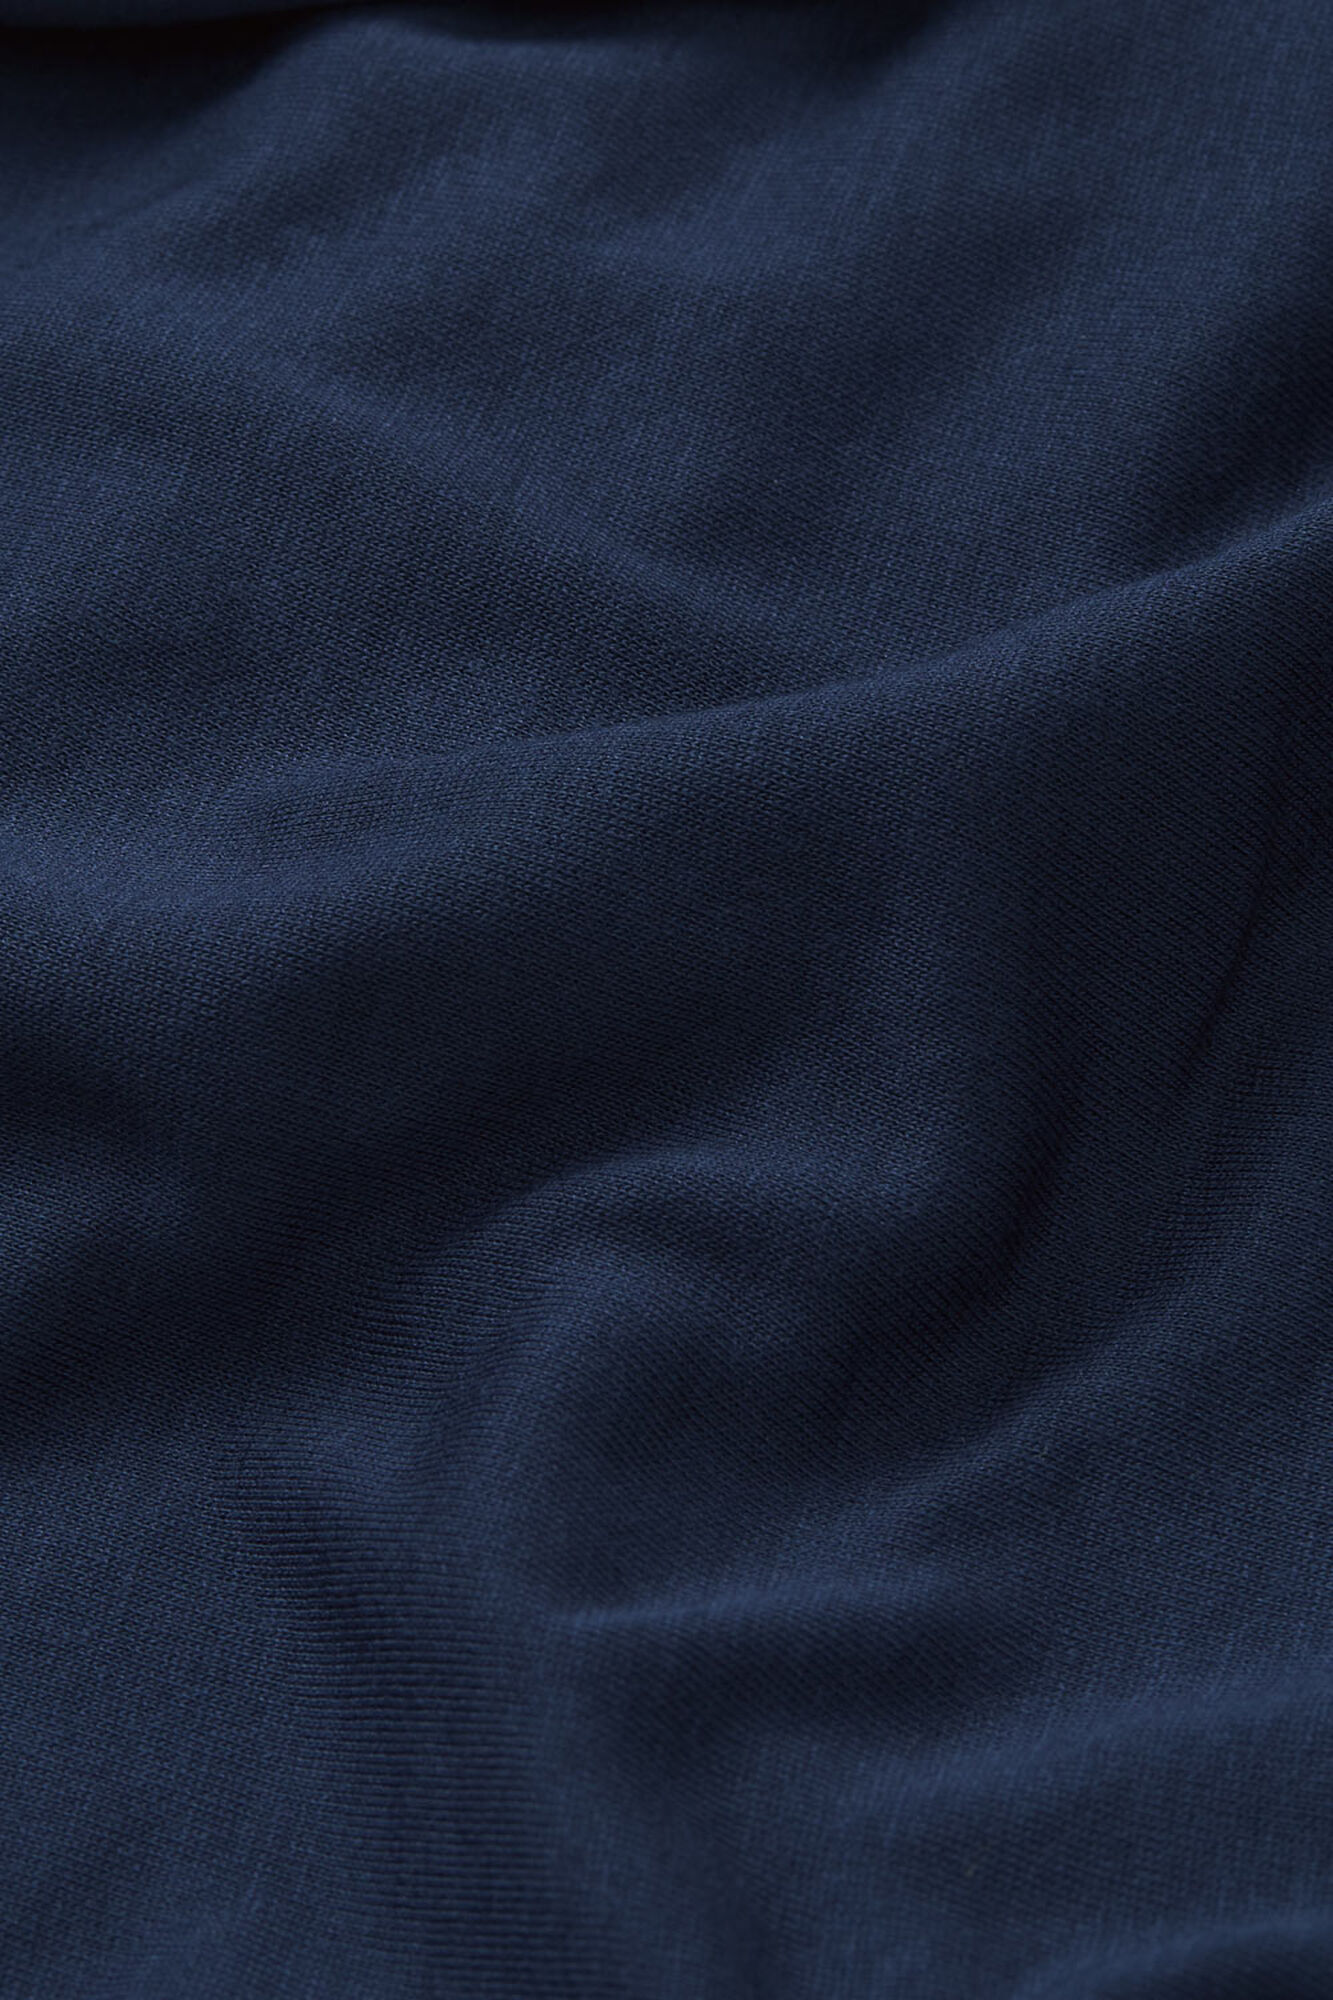 AMEGA SCARF, Navy Blazer, hi-res